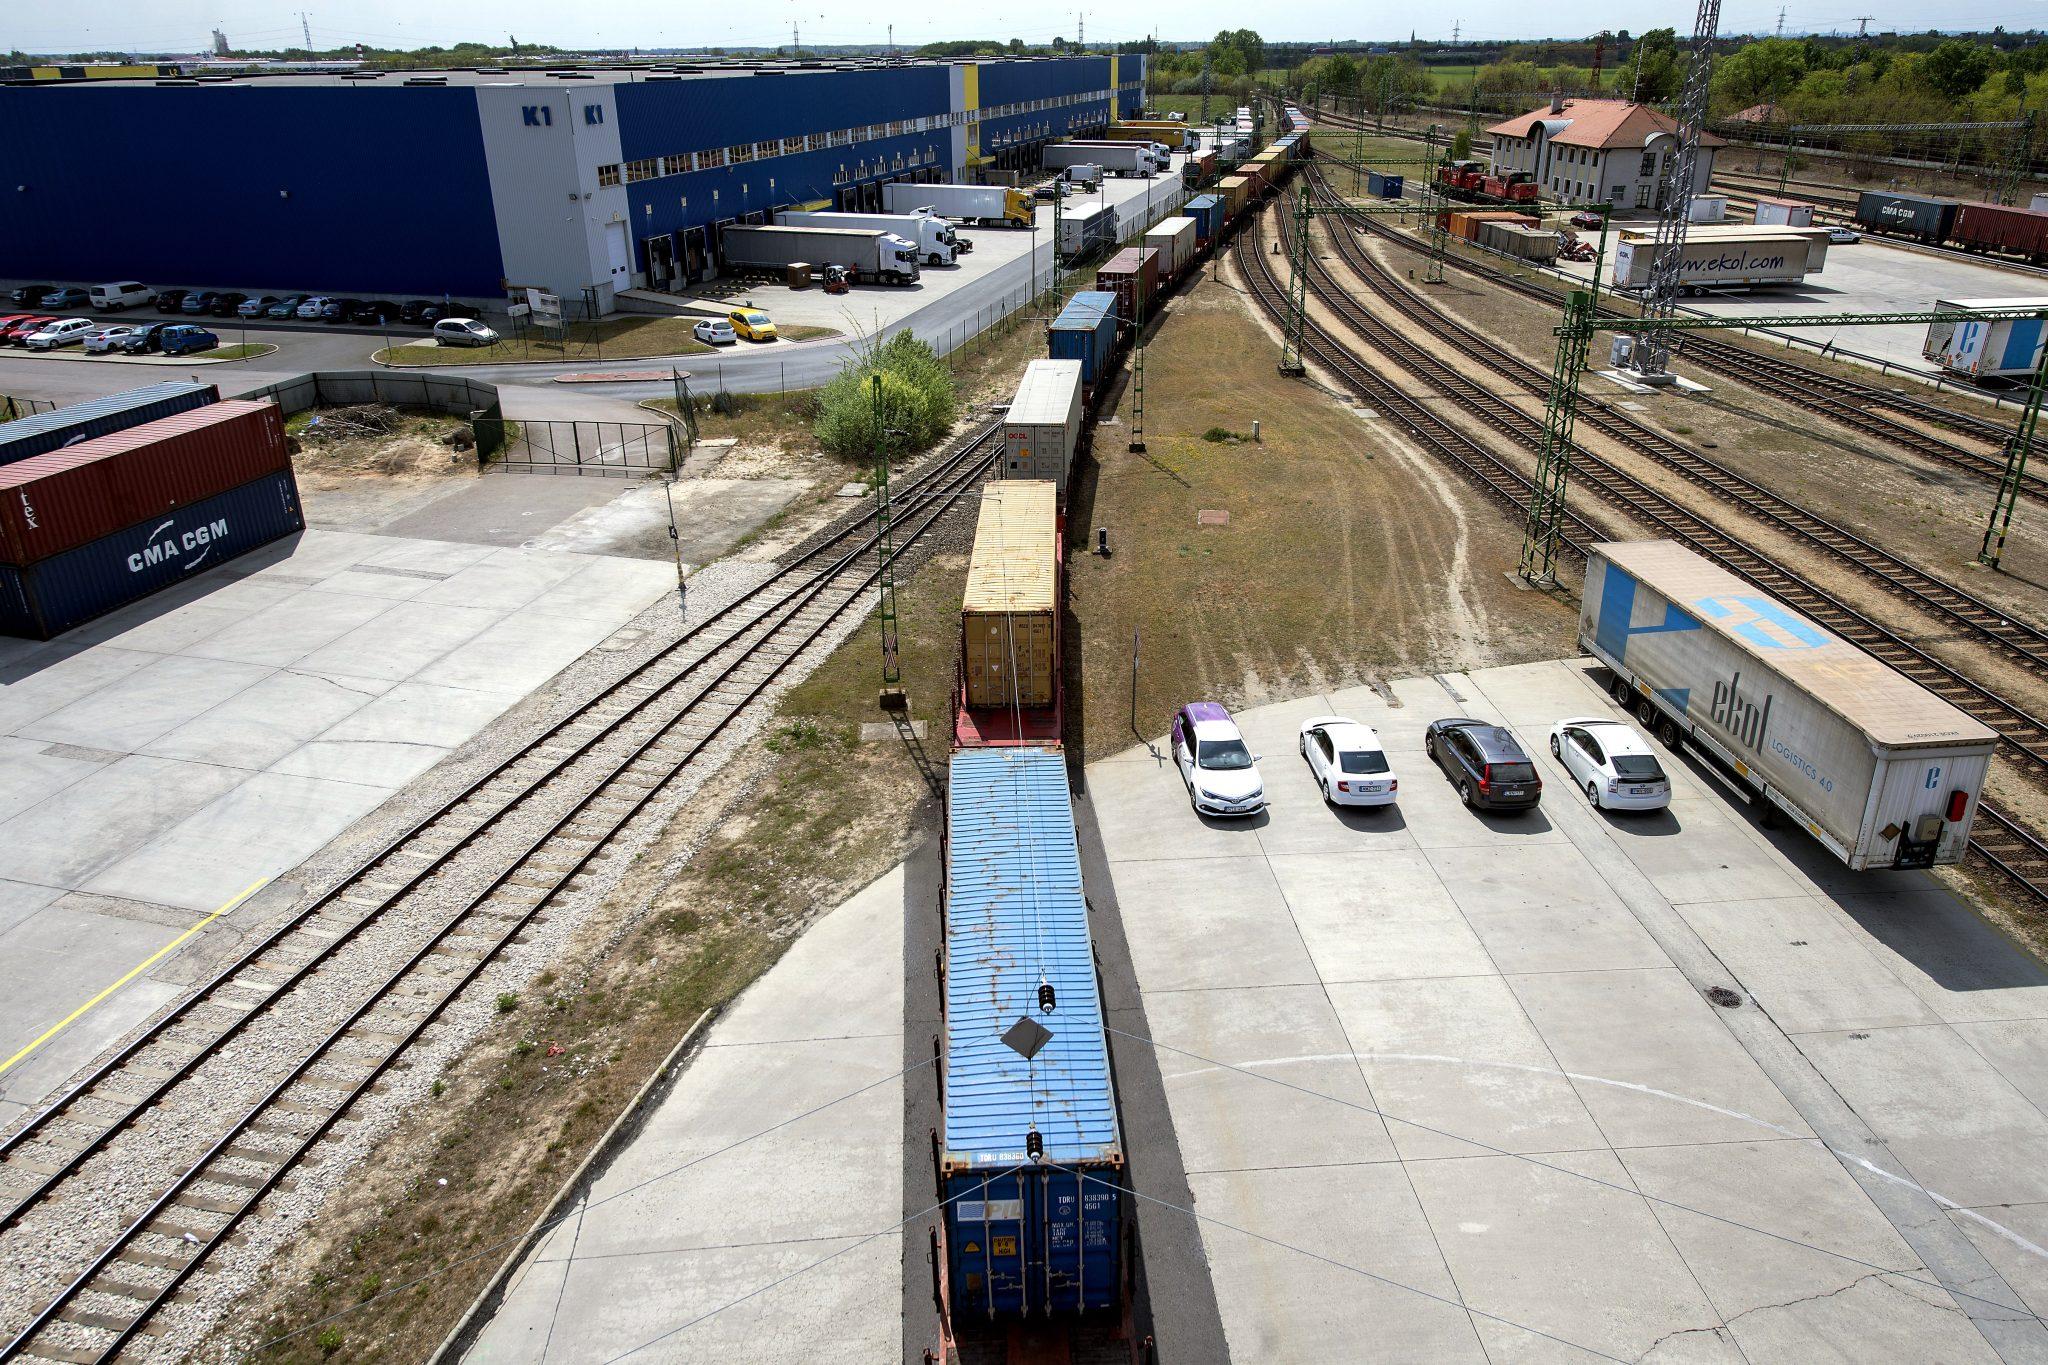 Gov't to Support Railway Cargo Transport with HUF 30 Billion Until 2025